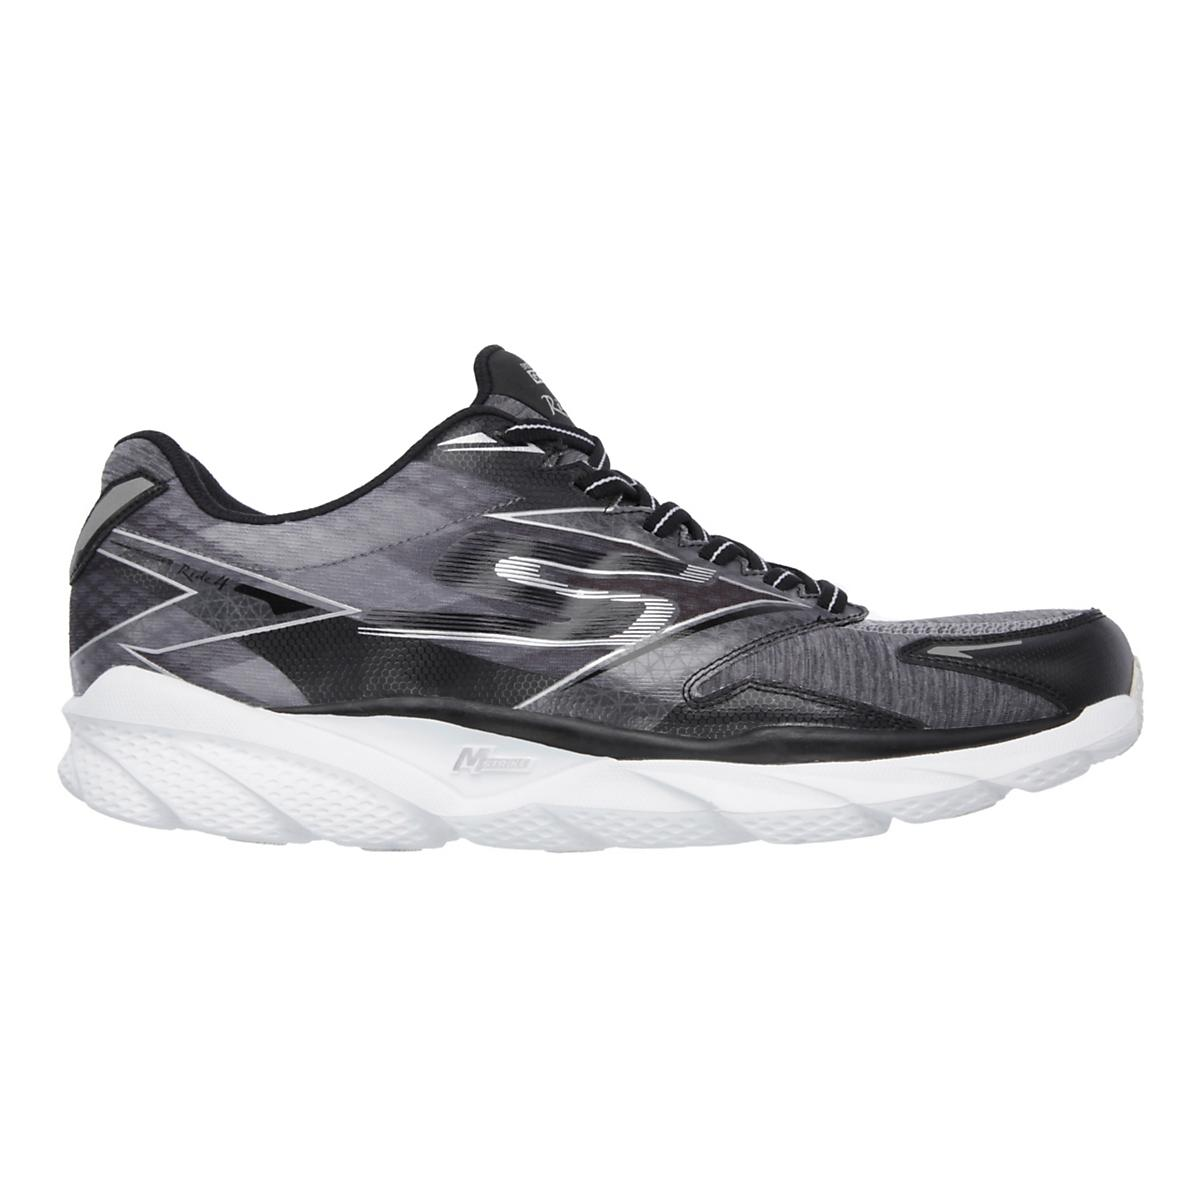 446a84e98687 Mens Skechers GO Run Ride 4 - Excess Running Shoe at Road Runner Sports